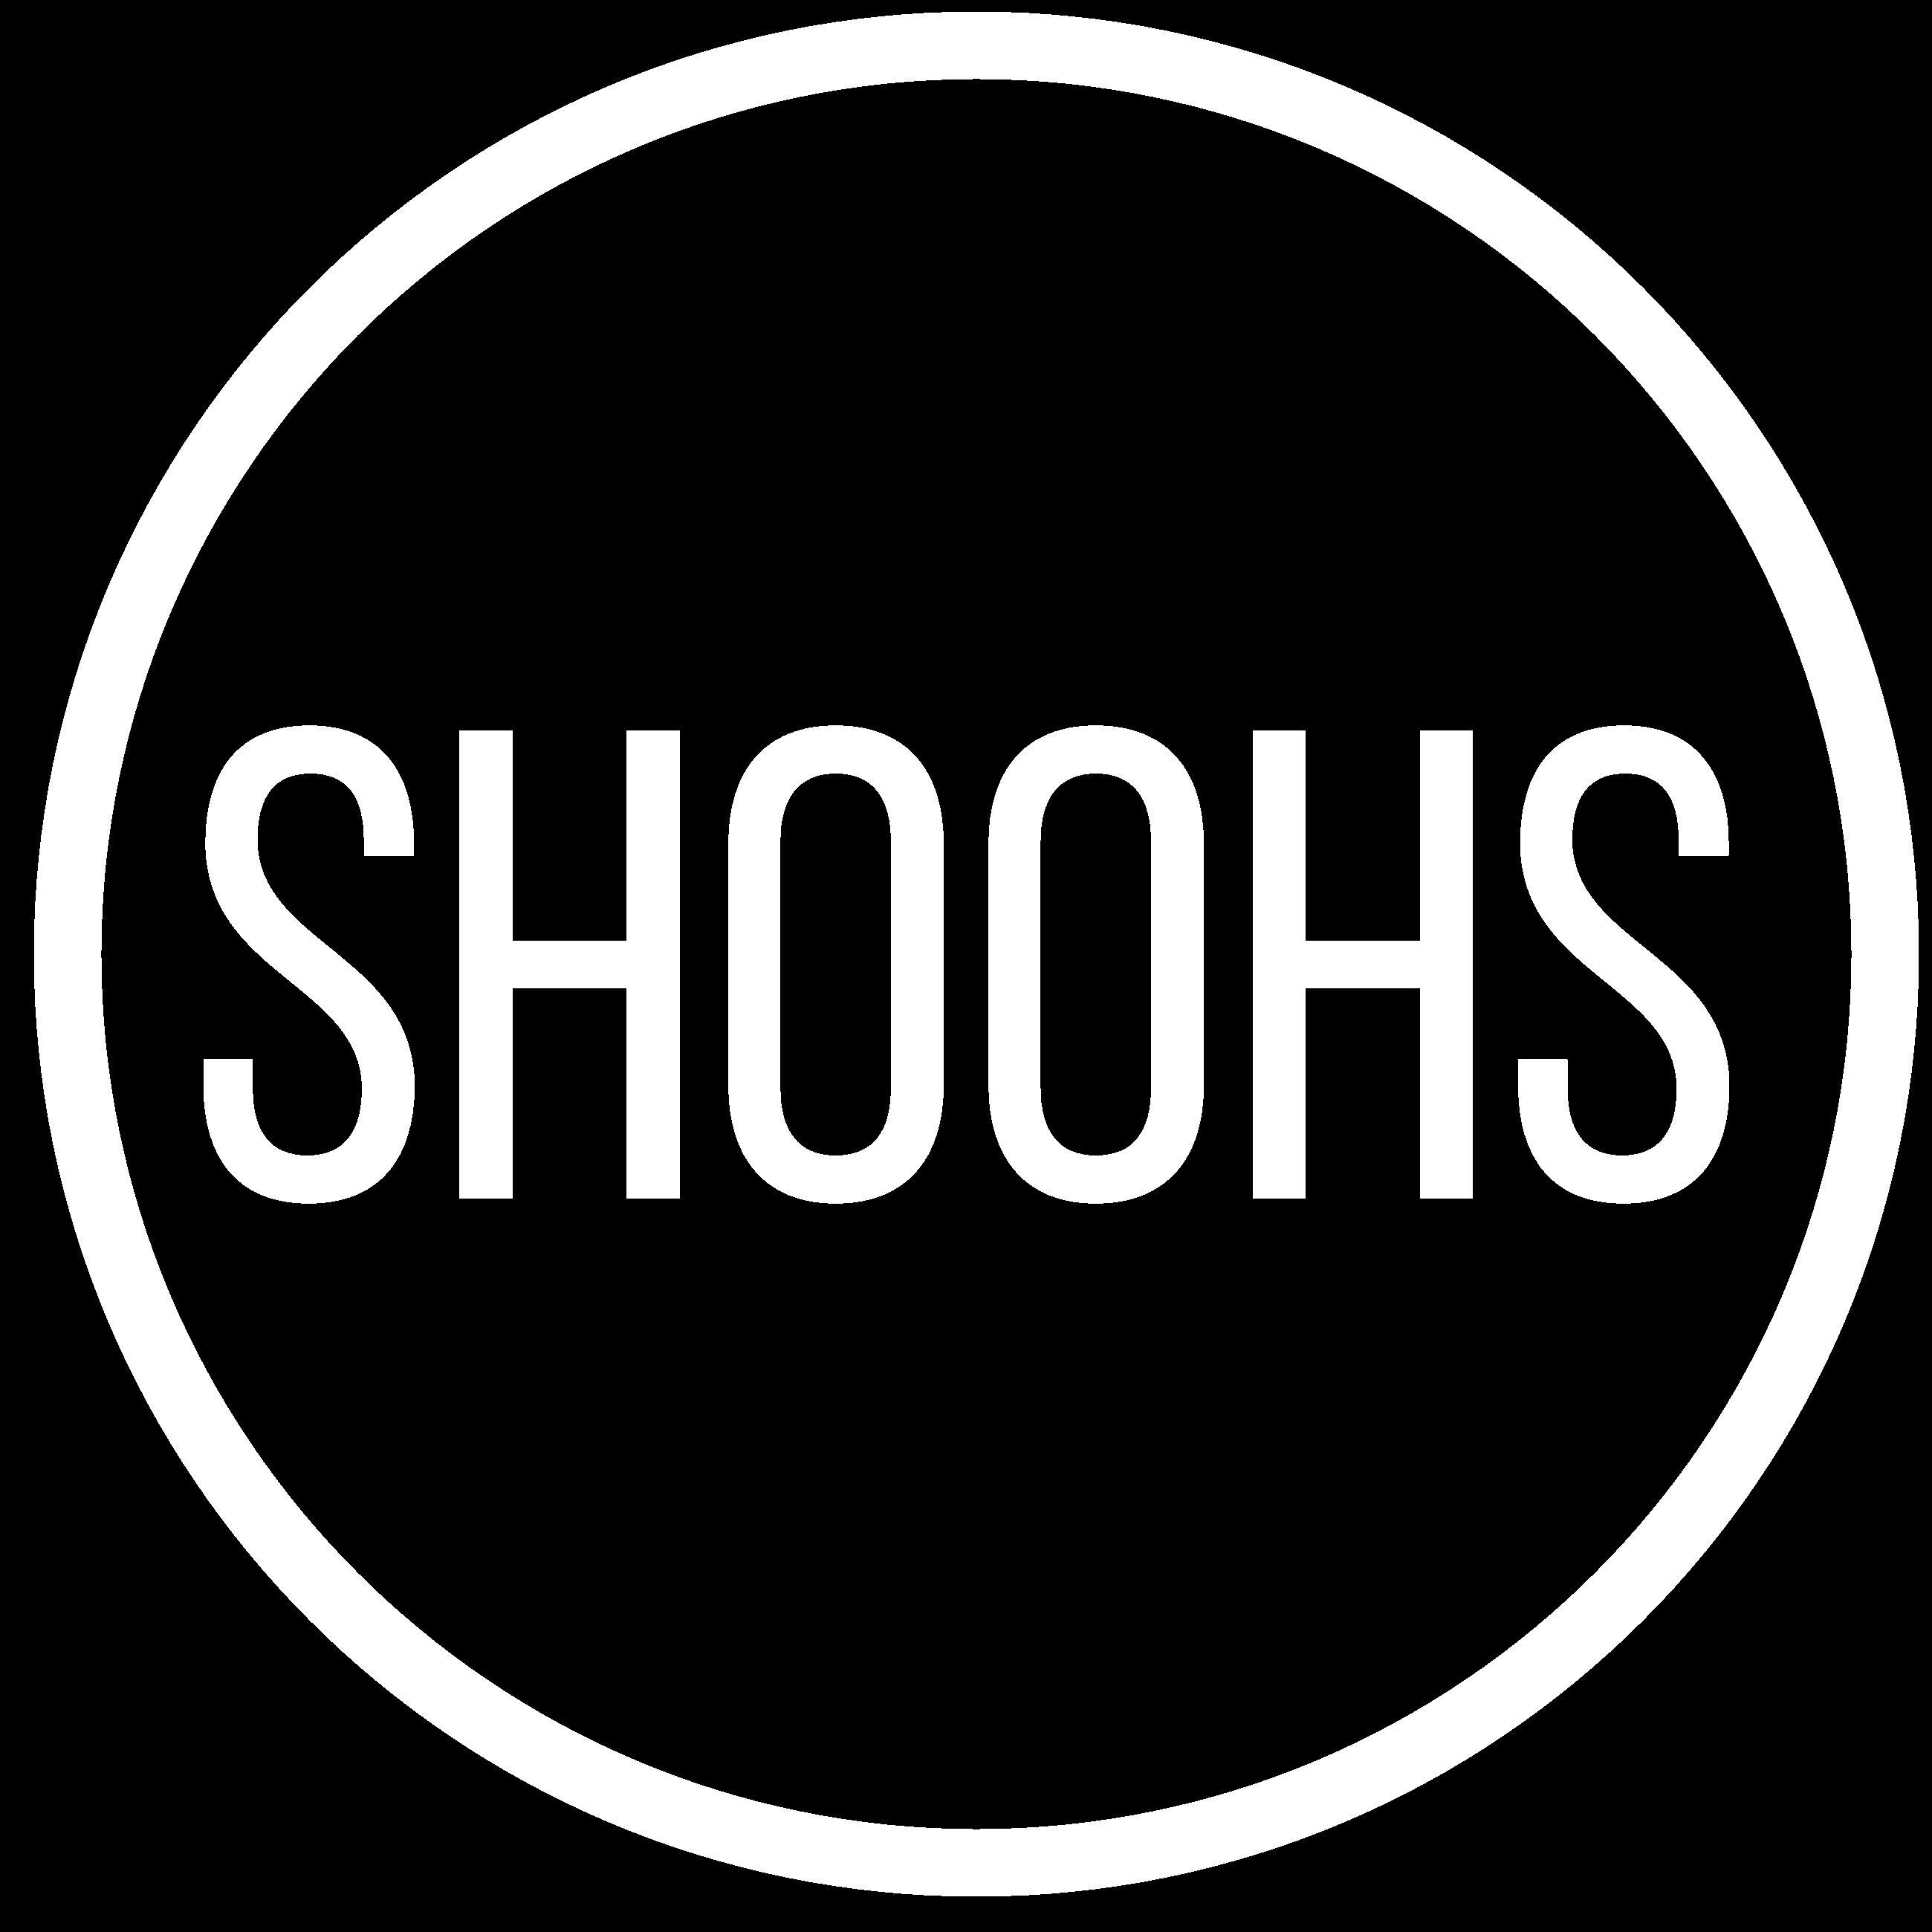 SHOOHS